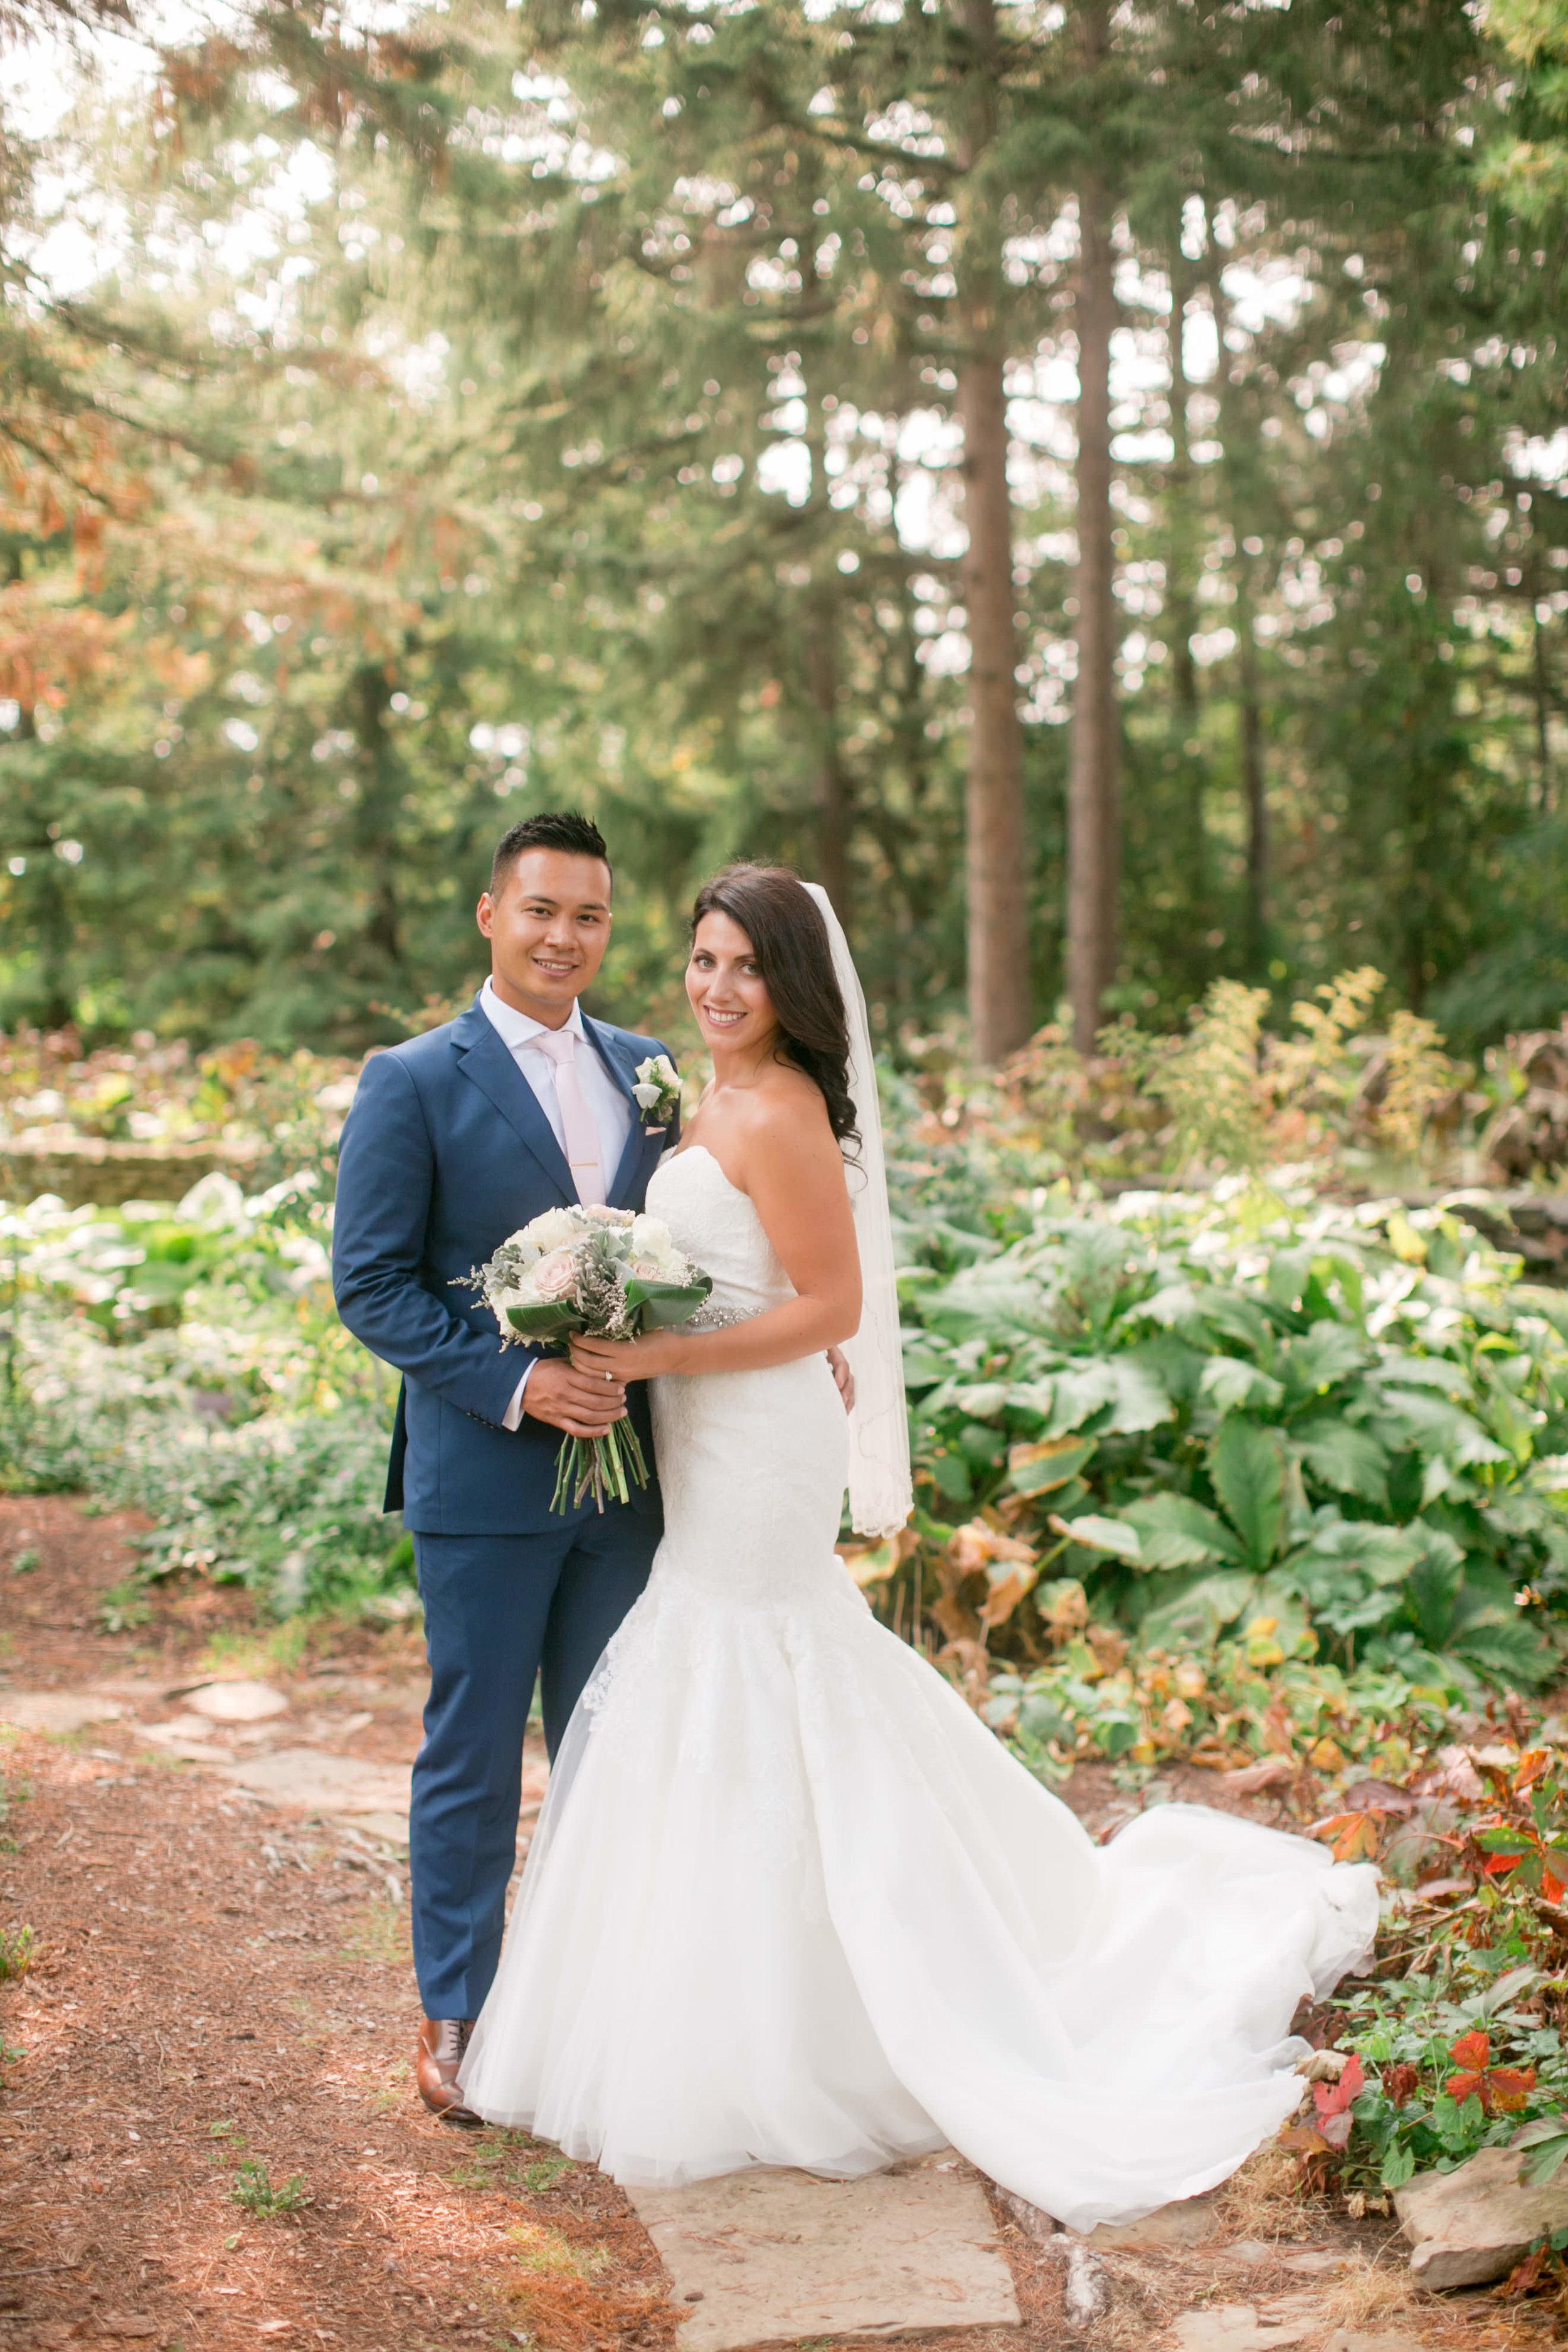 Stefanie___Bernard___Daniel_Ricci_Weddings_High_Res._Finals__366.jpg